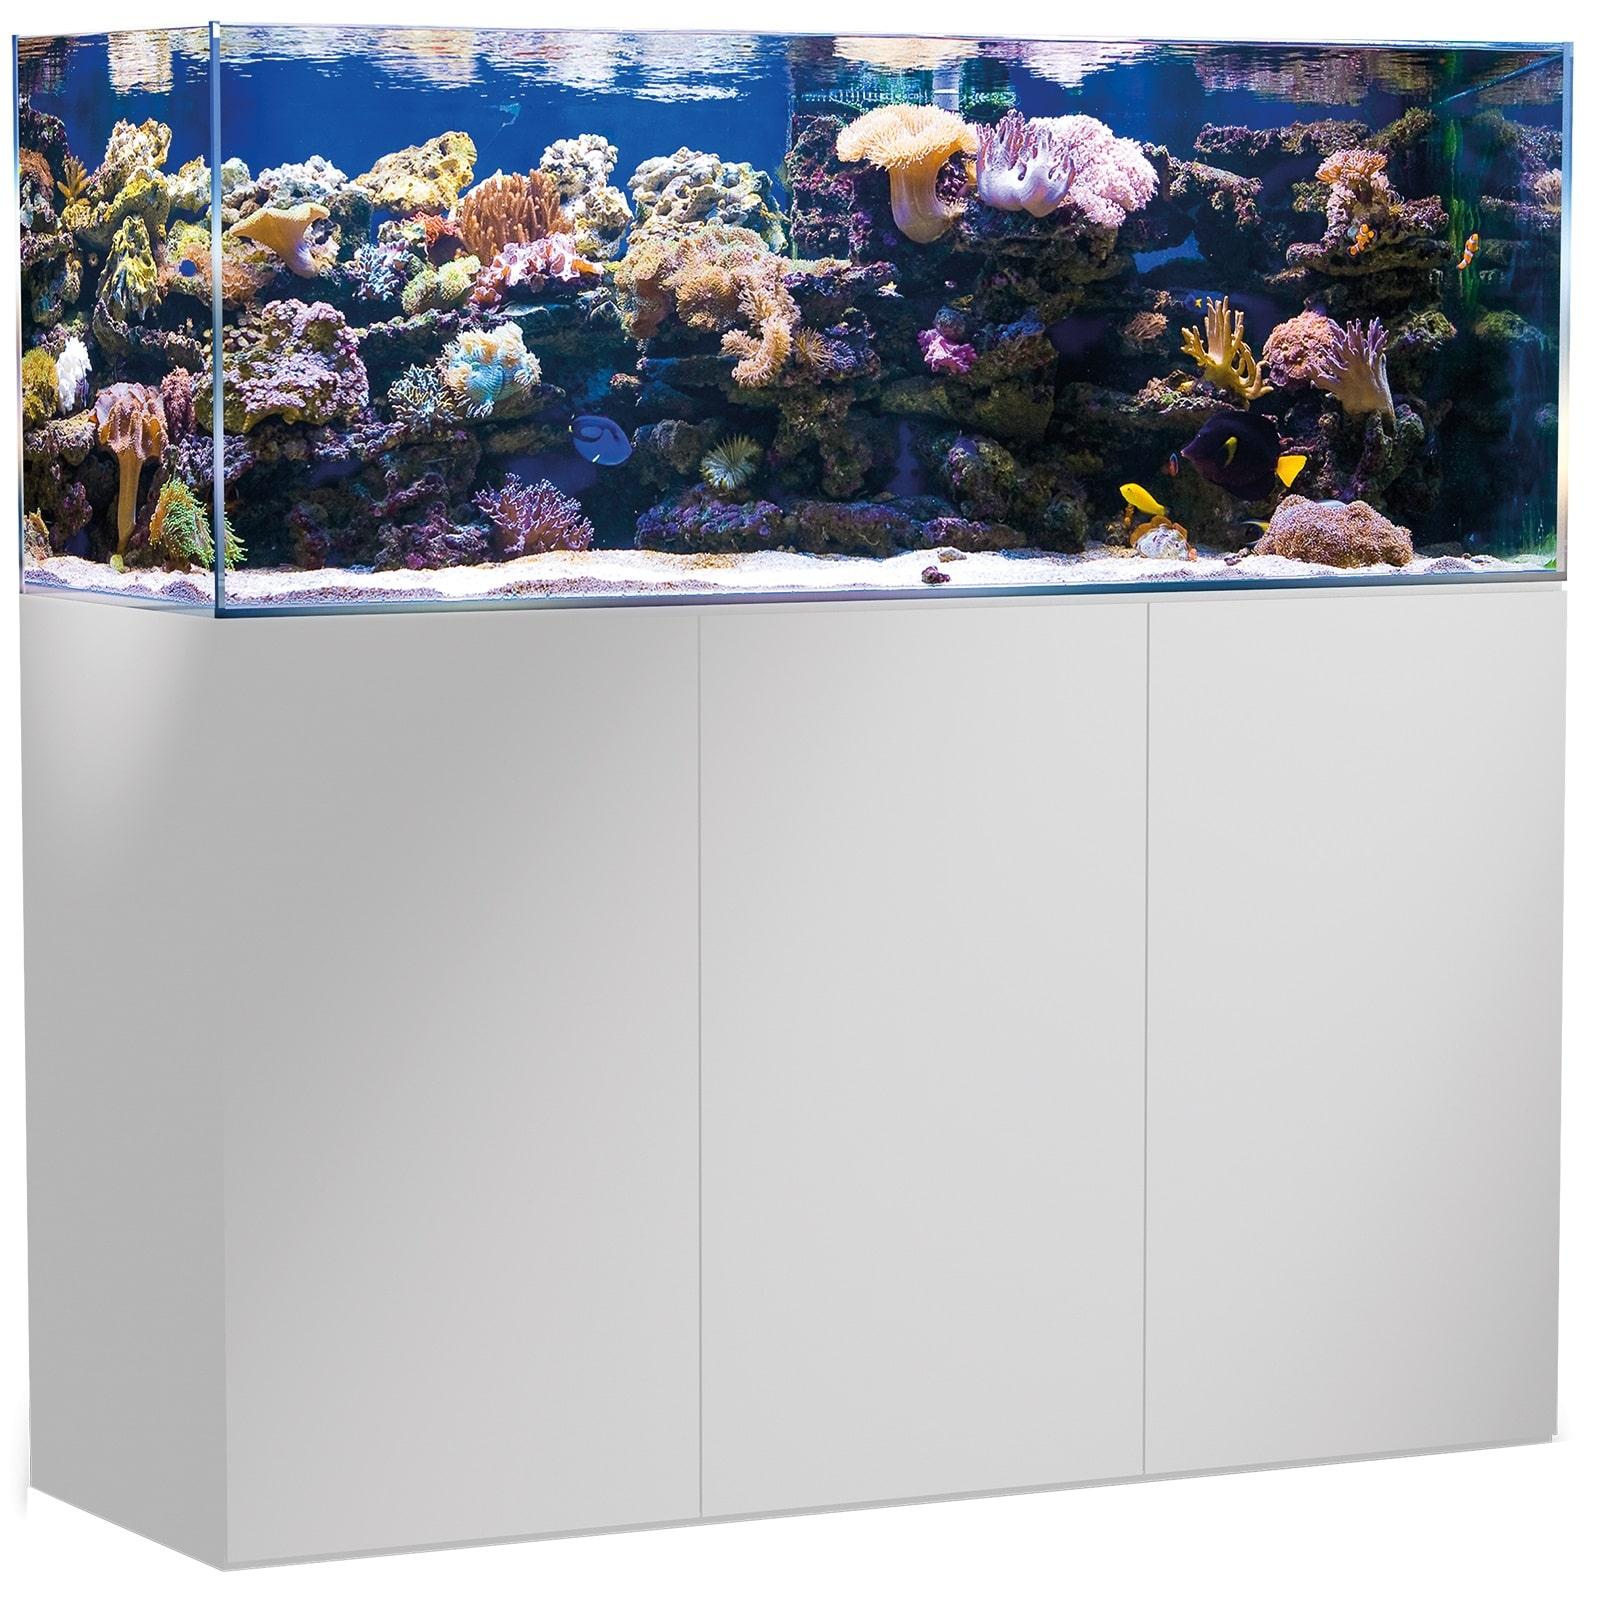 AQUA MEDIC Armatus 450 Blanc kit aquarium eau de mer 375 L avec meuble et décantation